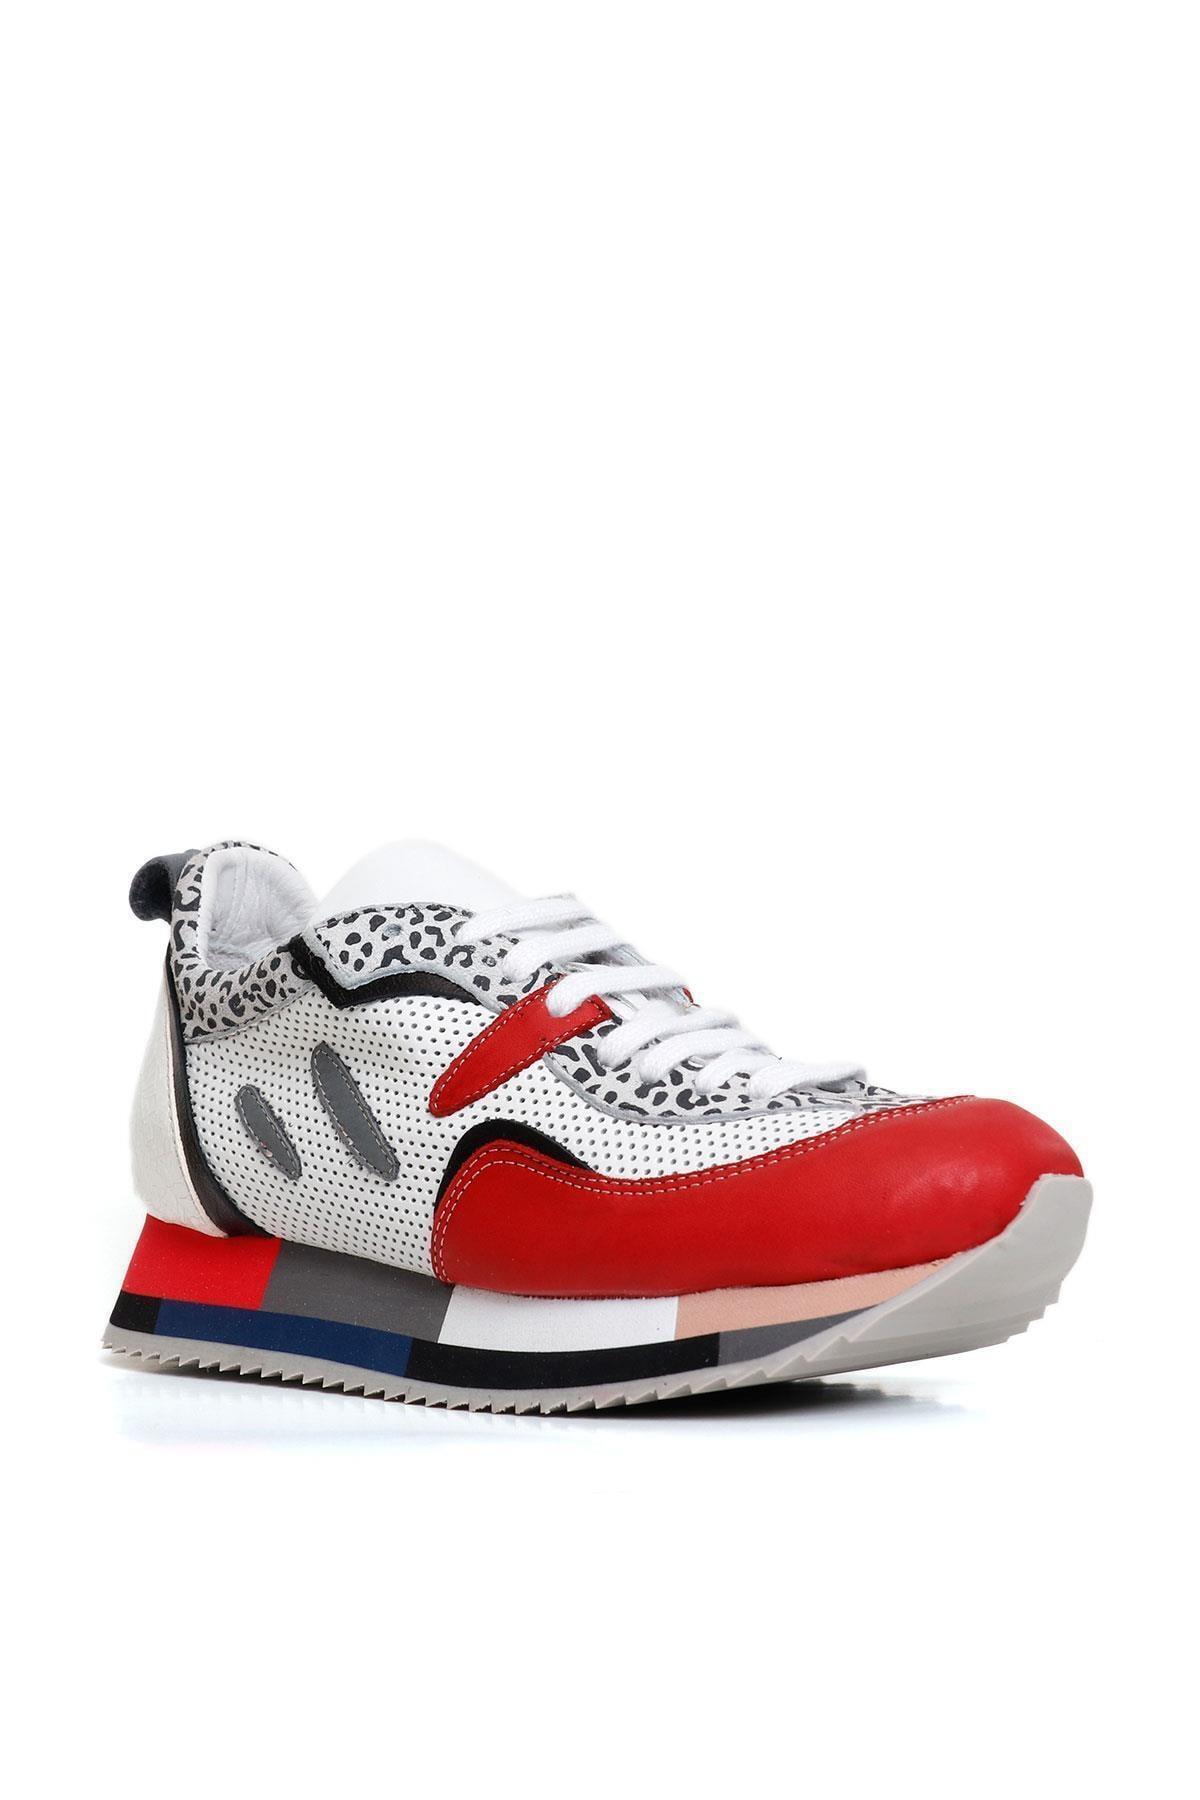 BUENO Shoes Kadın Spor 20wq5403 2